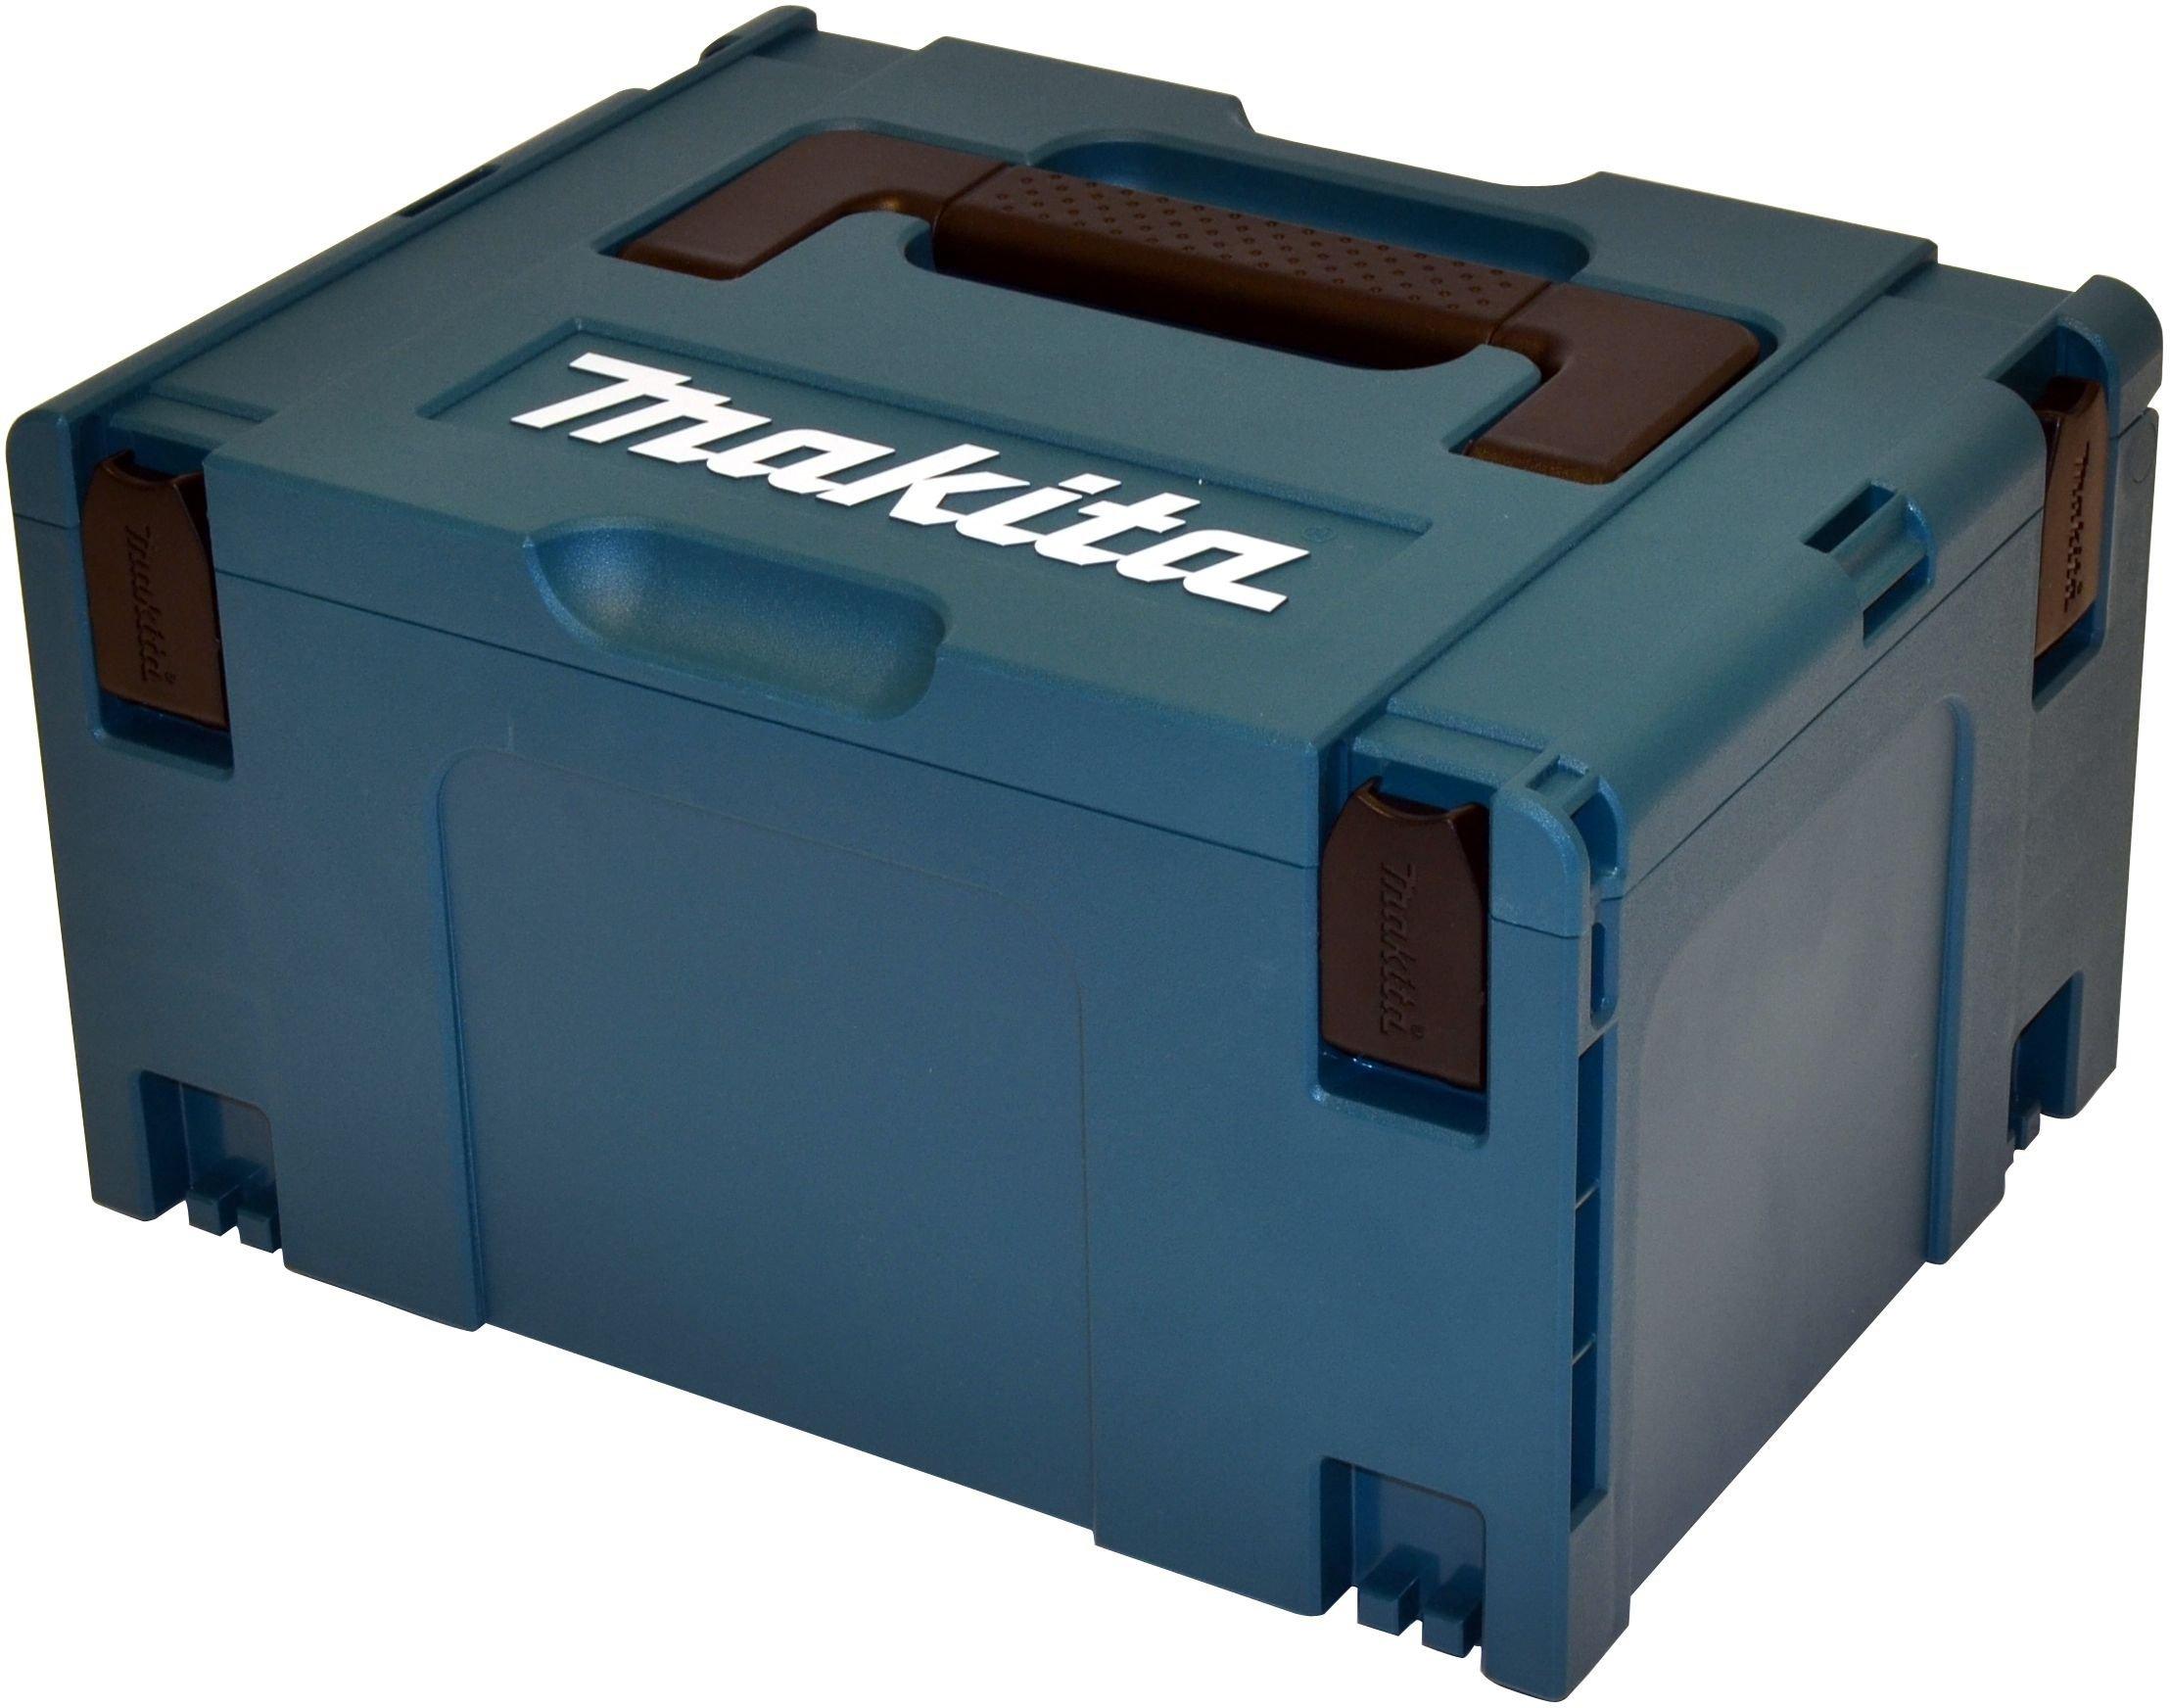 Makita – Lijadora rotorbital BO6050J 750w 1600-6800 opm, azul y negro